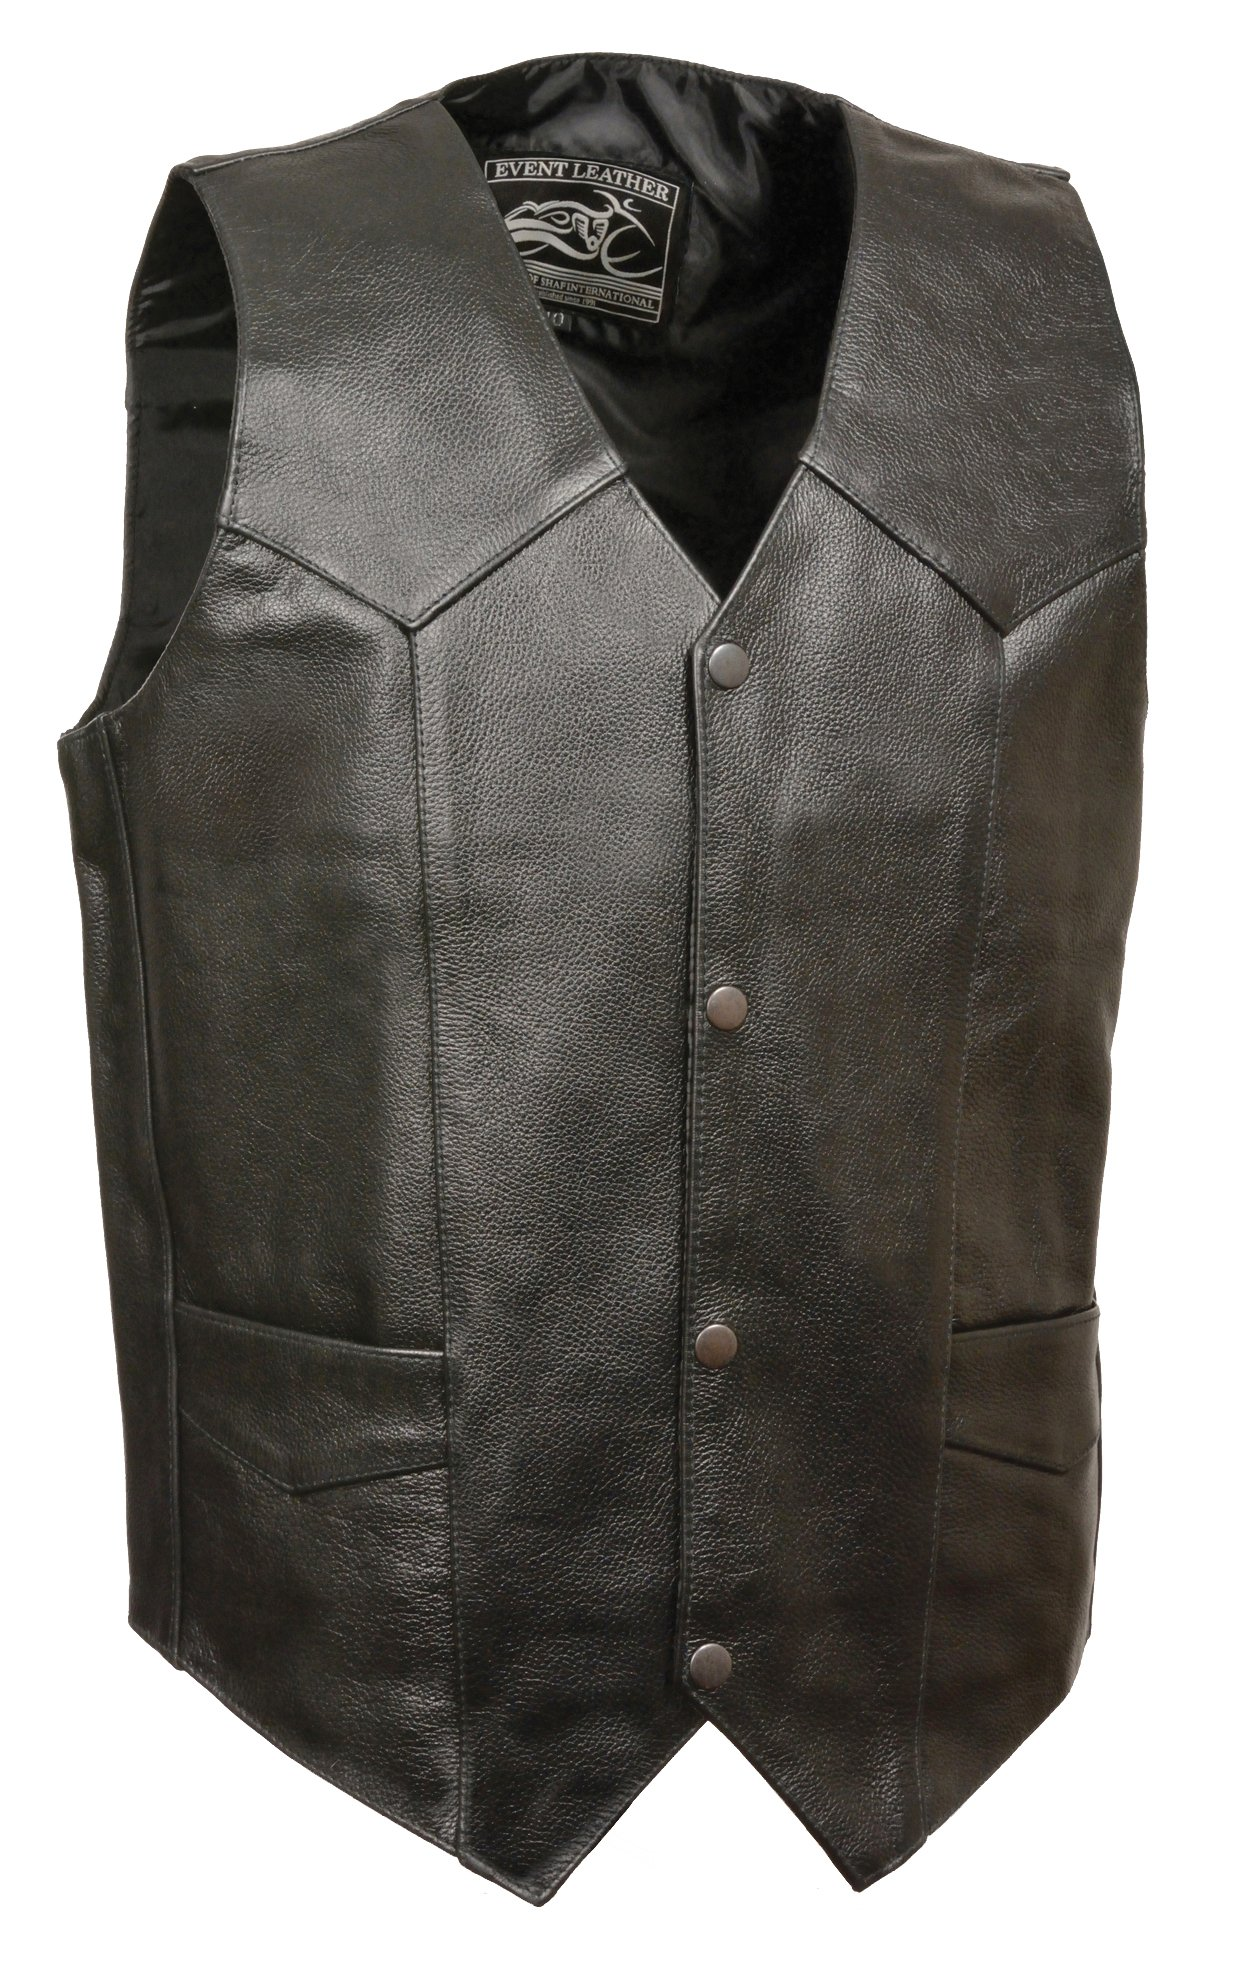 Event Biker Leather Men's Promo Basic Leather Vest (Black, XX-Large)